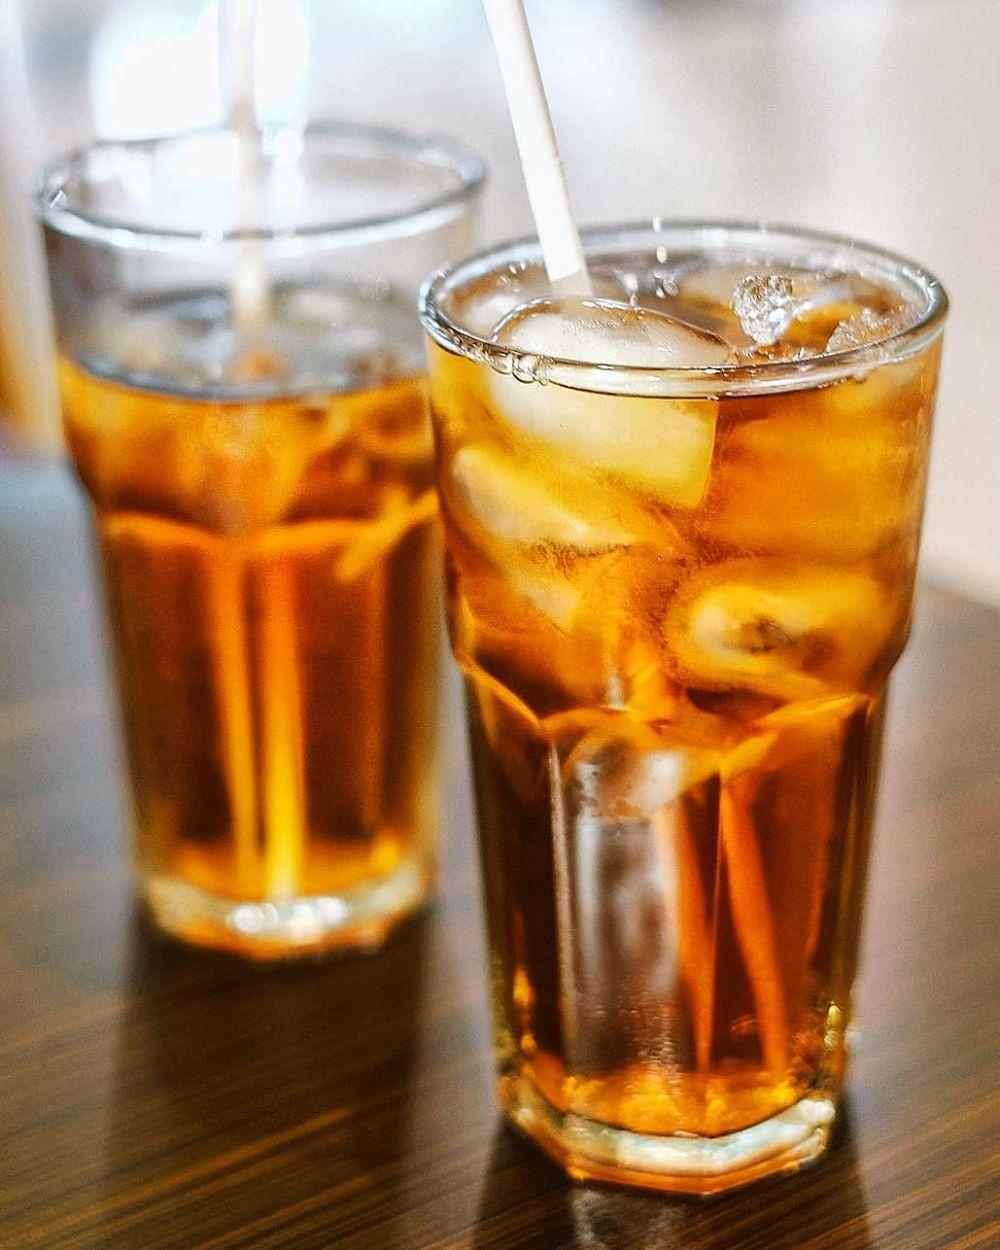 20 Resep Minuman Segar Instagram Resep Minuman Minuman Teh Manis